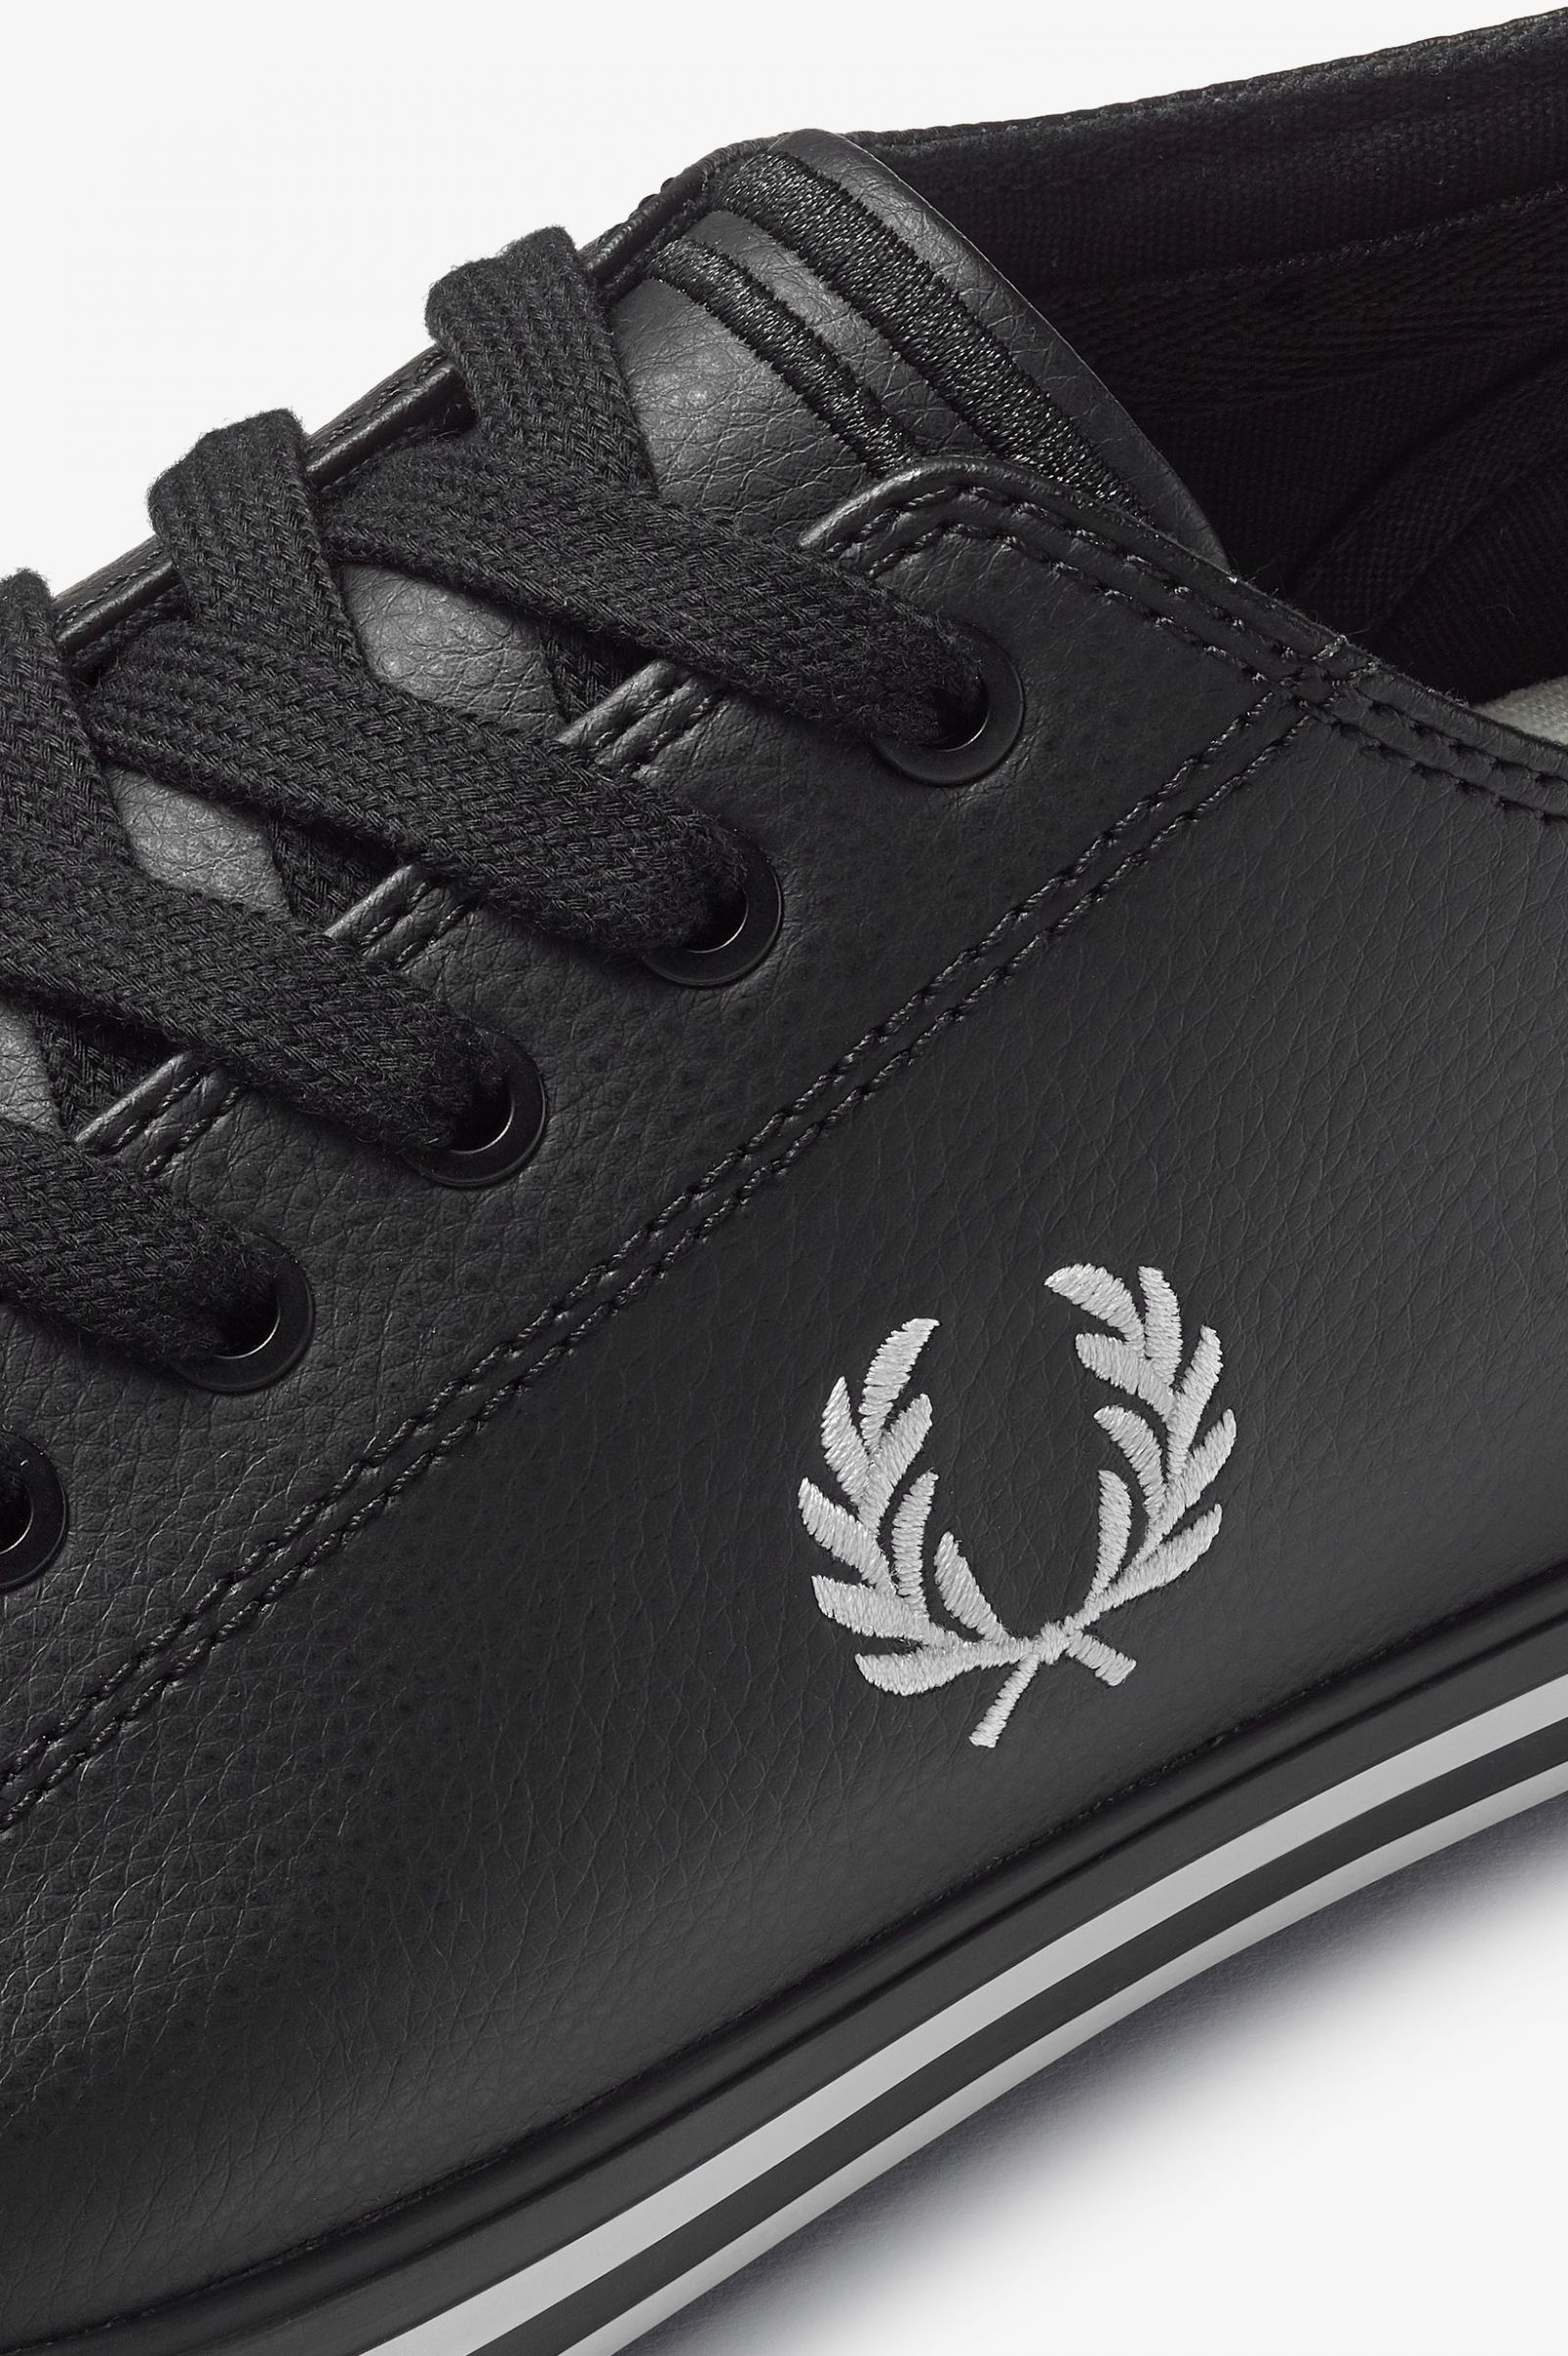 Kingston Leather - Black | Men's